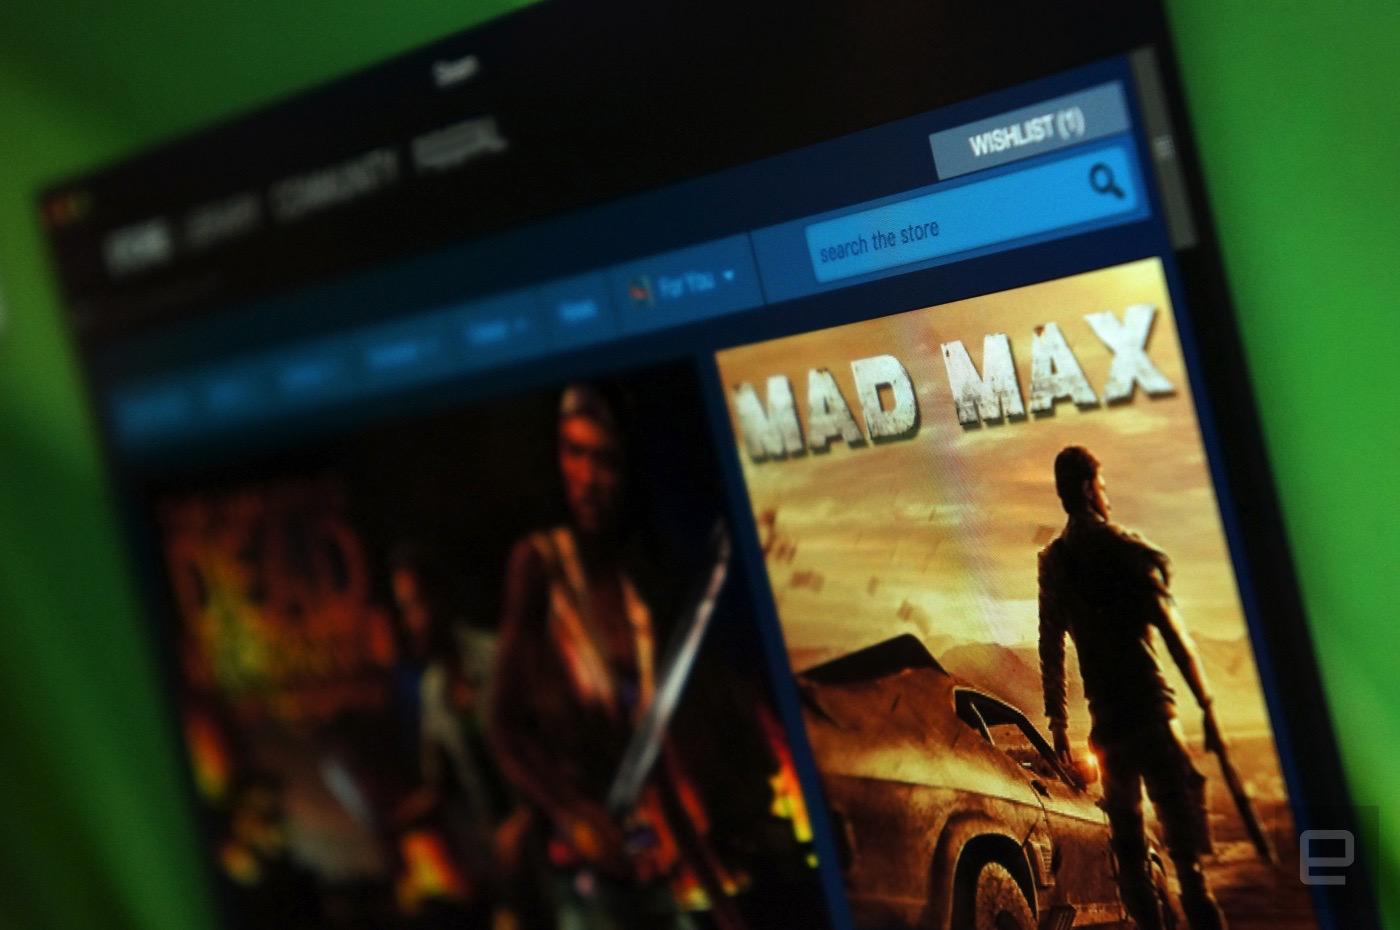 Australia: Steam's old no-refund policy broke the law